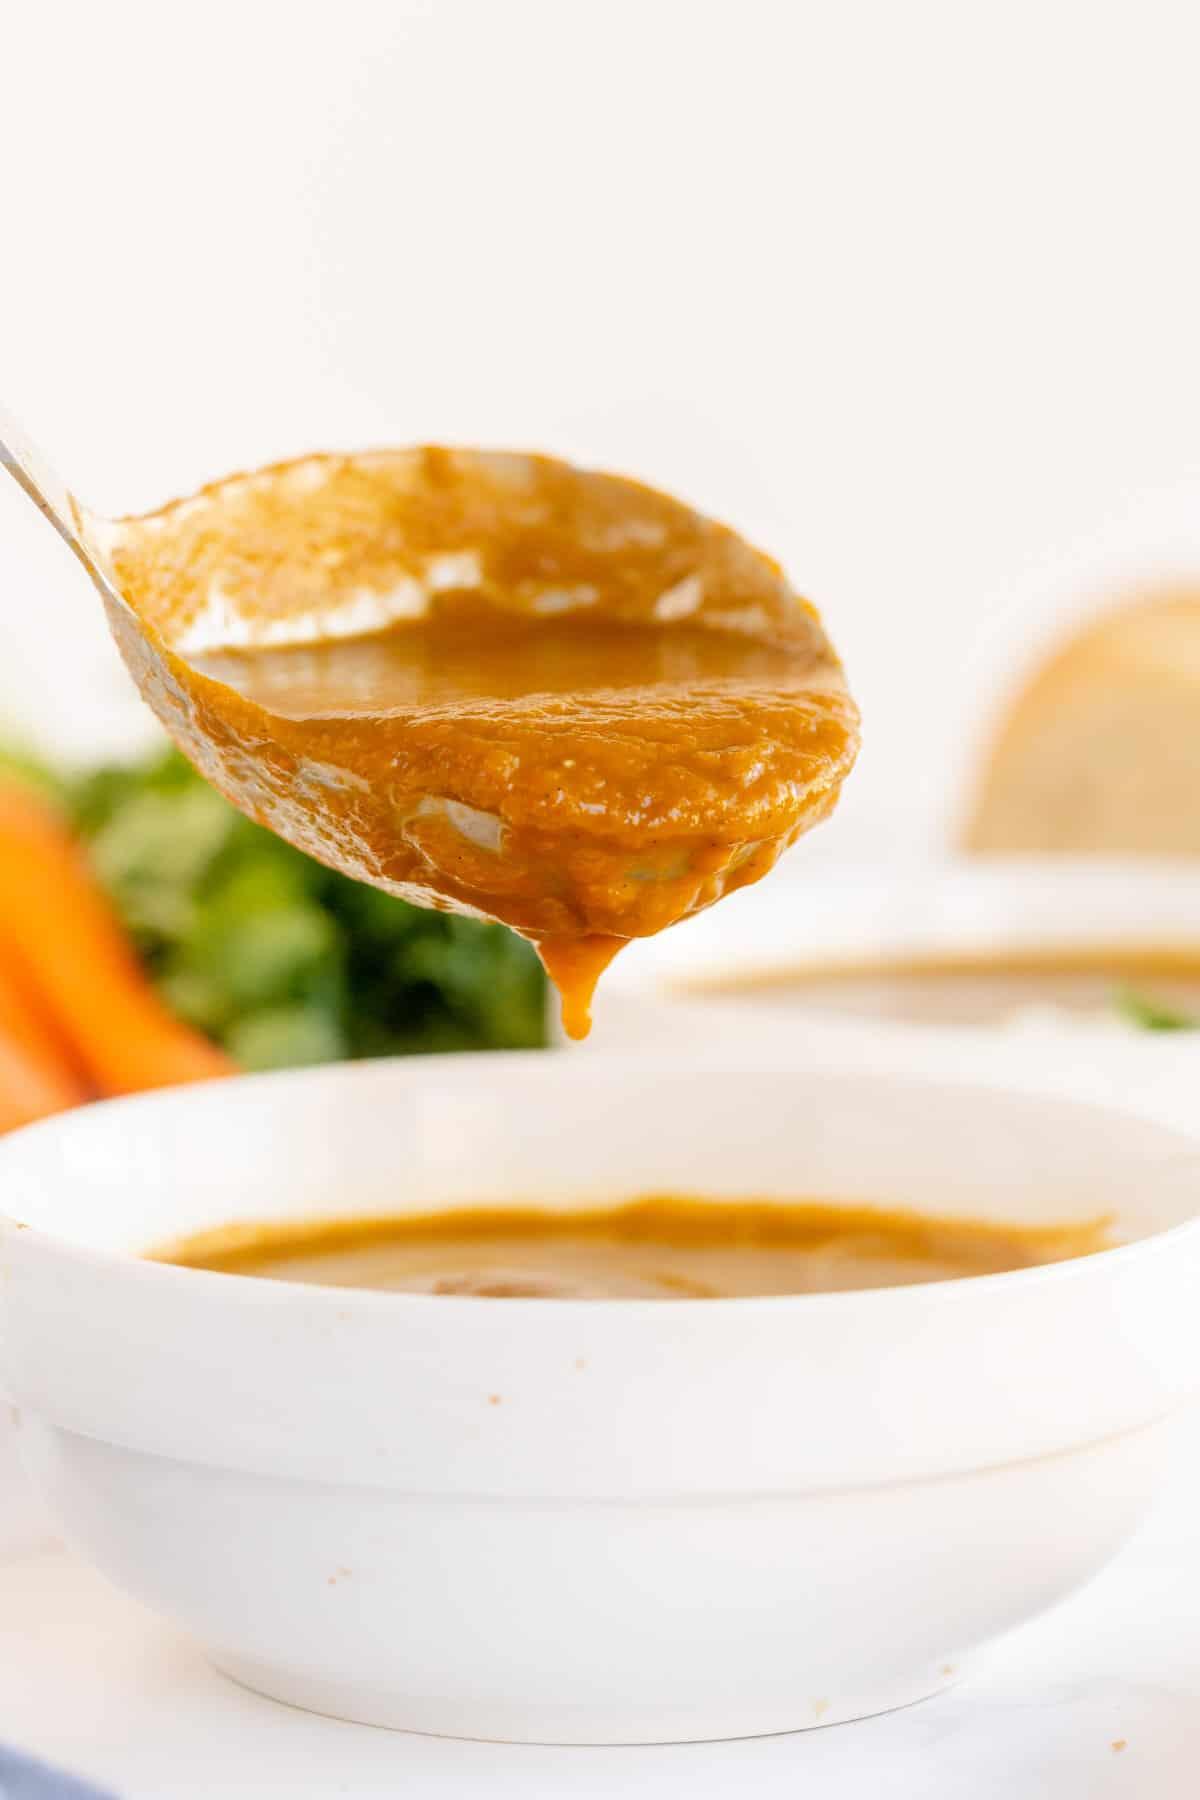 ladle full of carrot soup